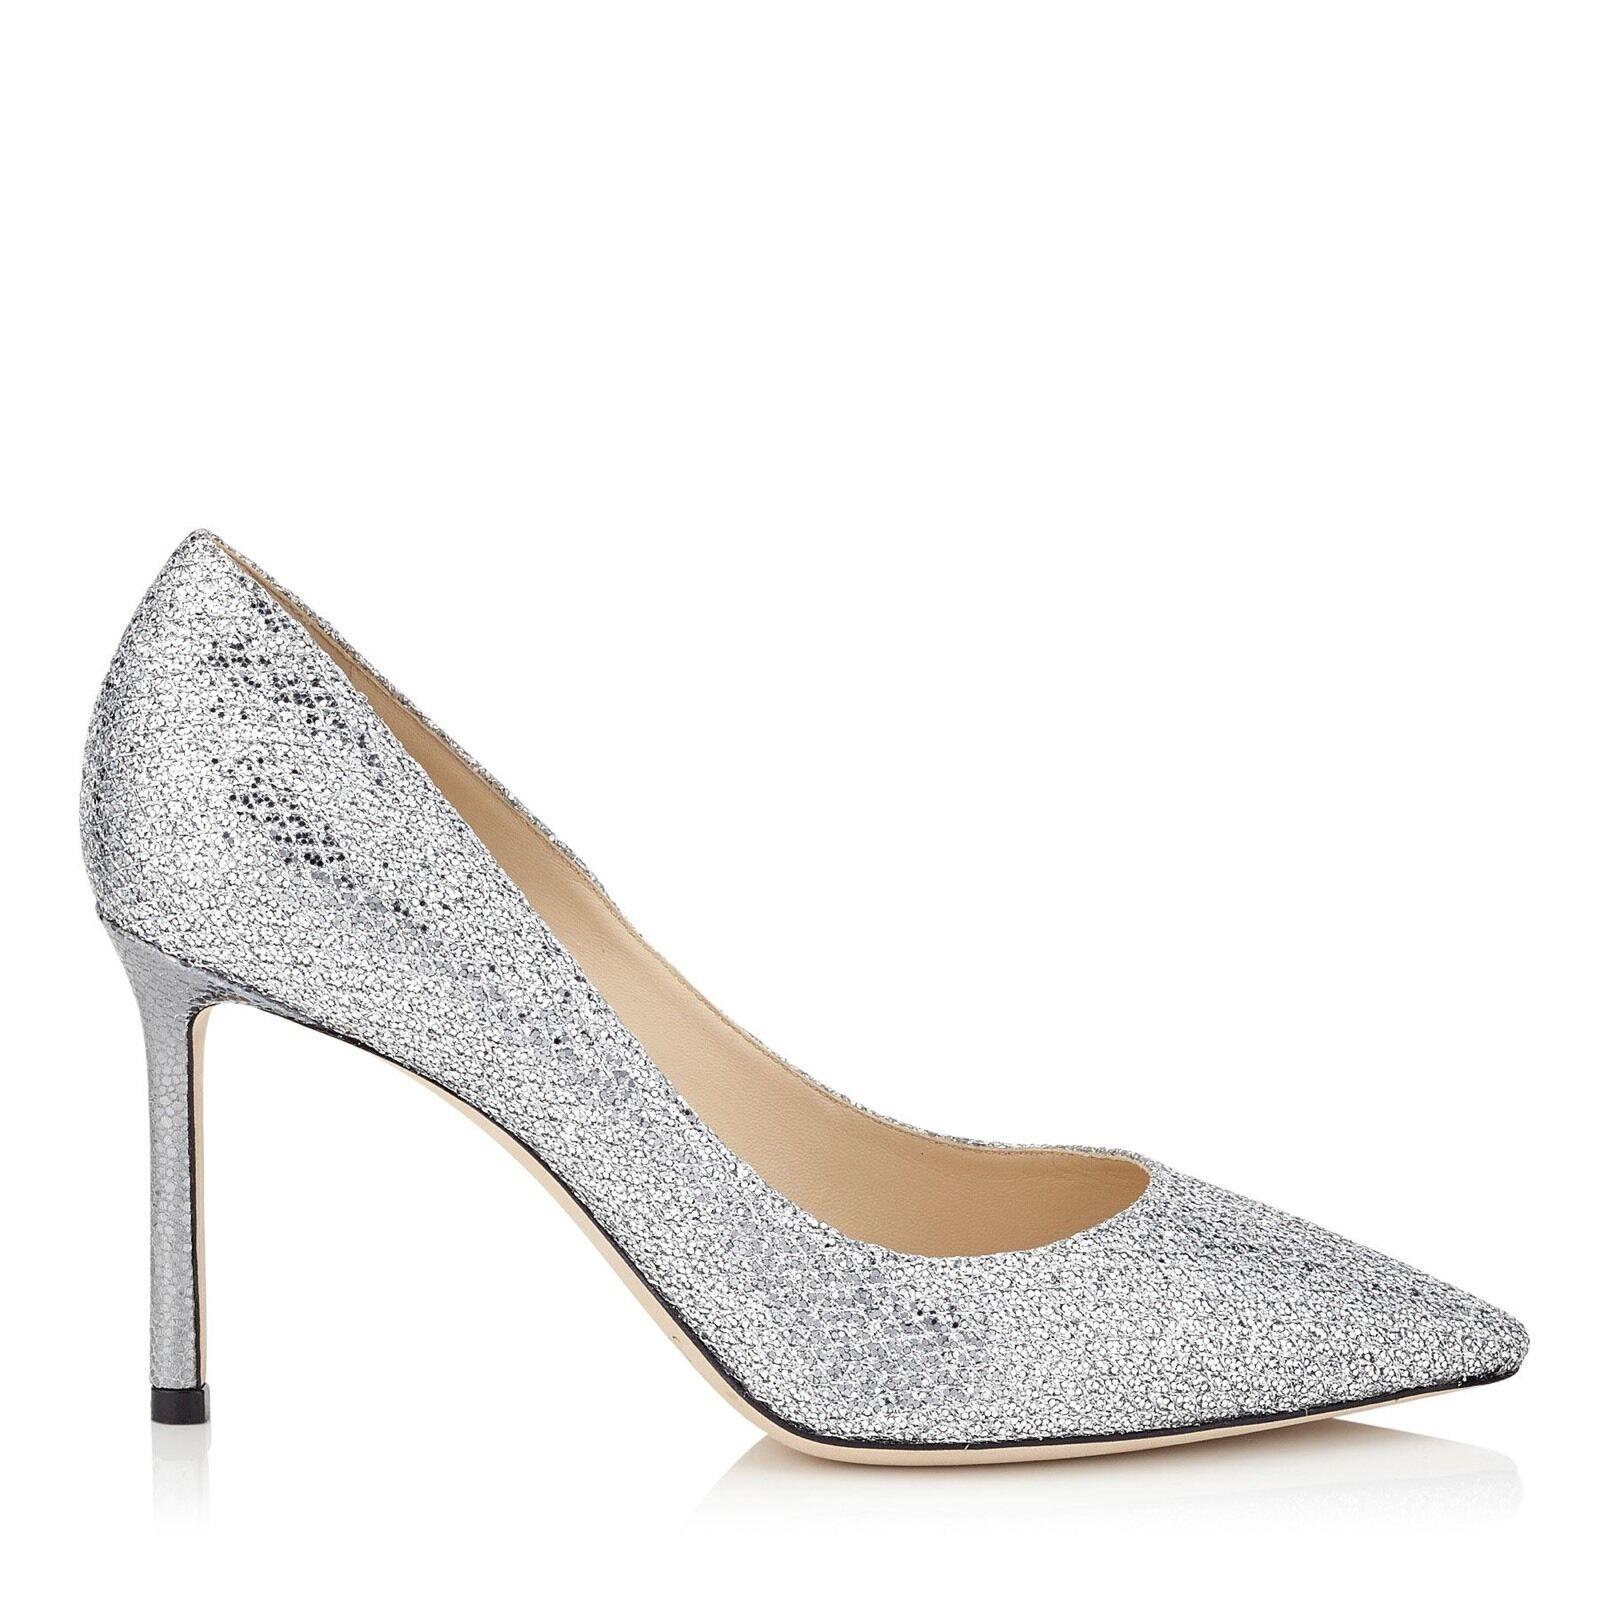 Jimmy Choo Romy 85 Glitter Silber Court Stiletto Heels schuhe Größe Eu 40 Uk 7